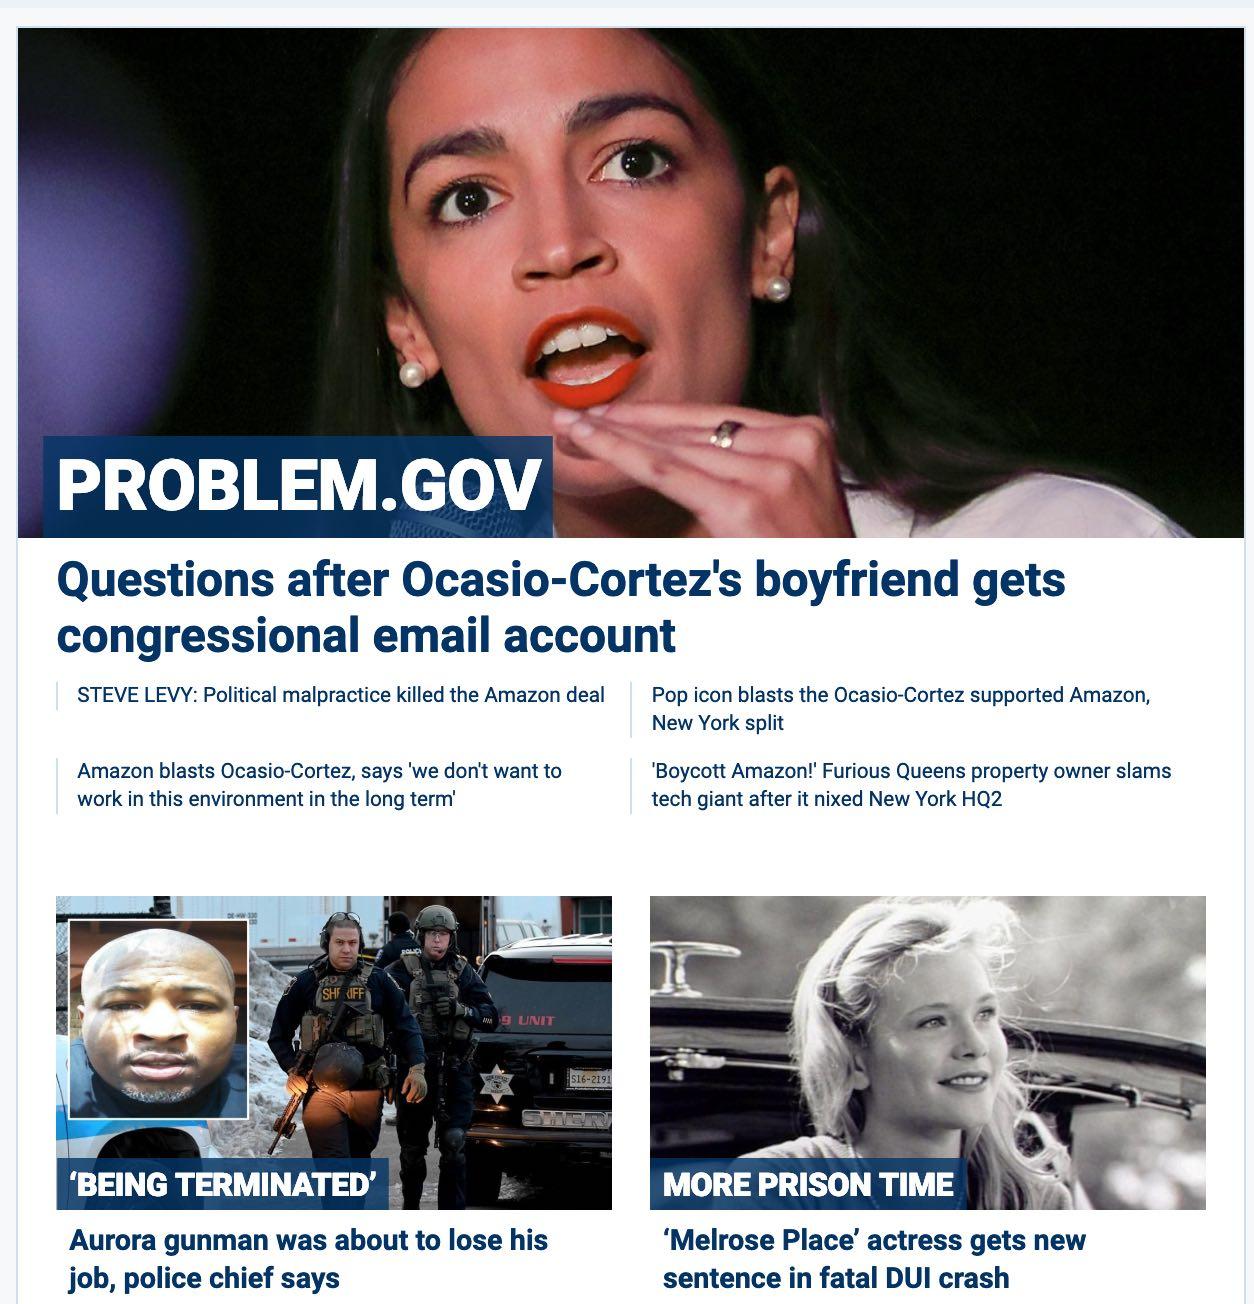 Fox -- no emergency stories